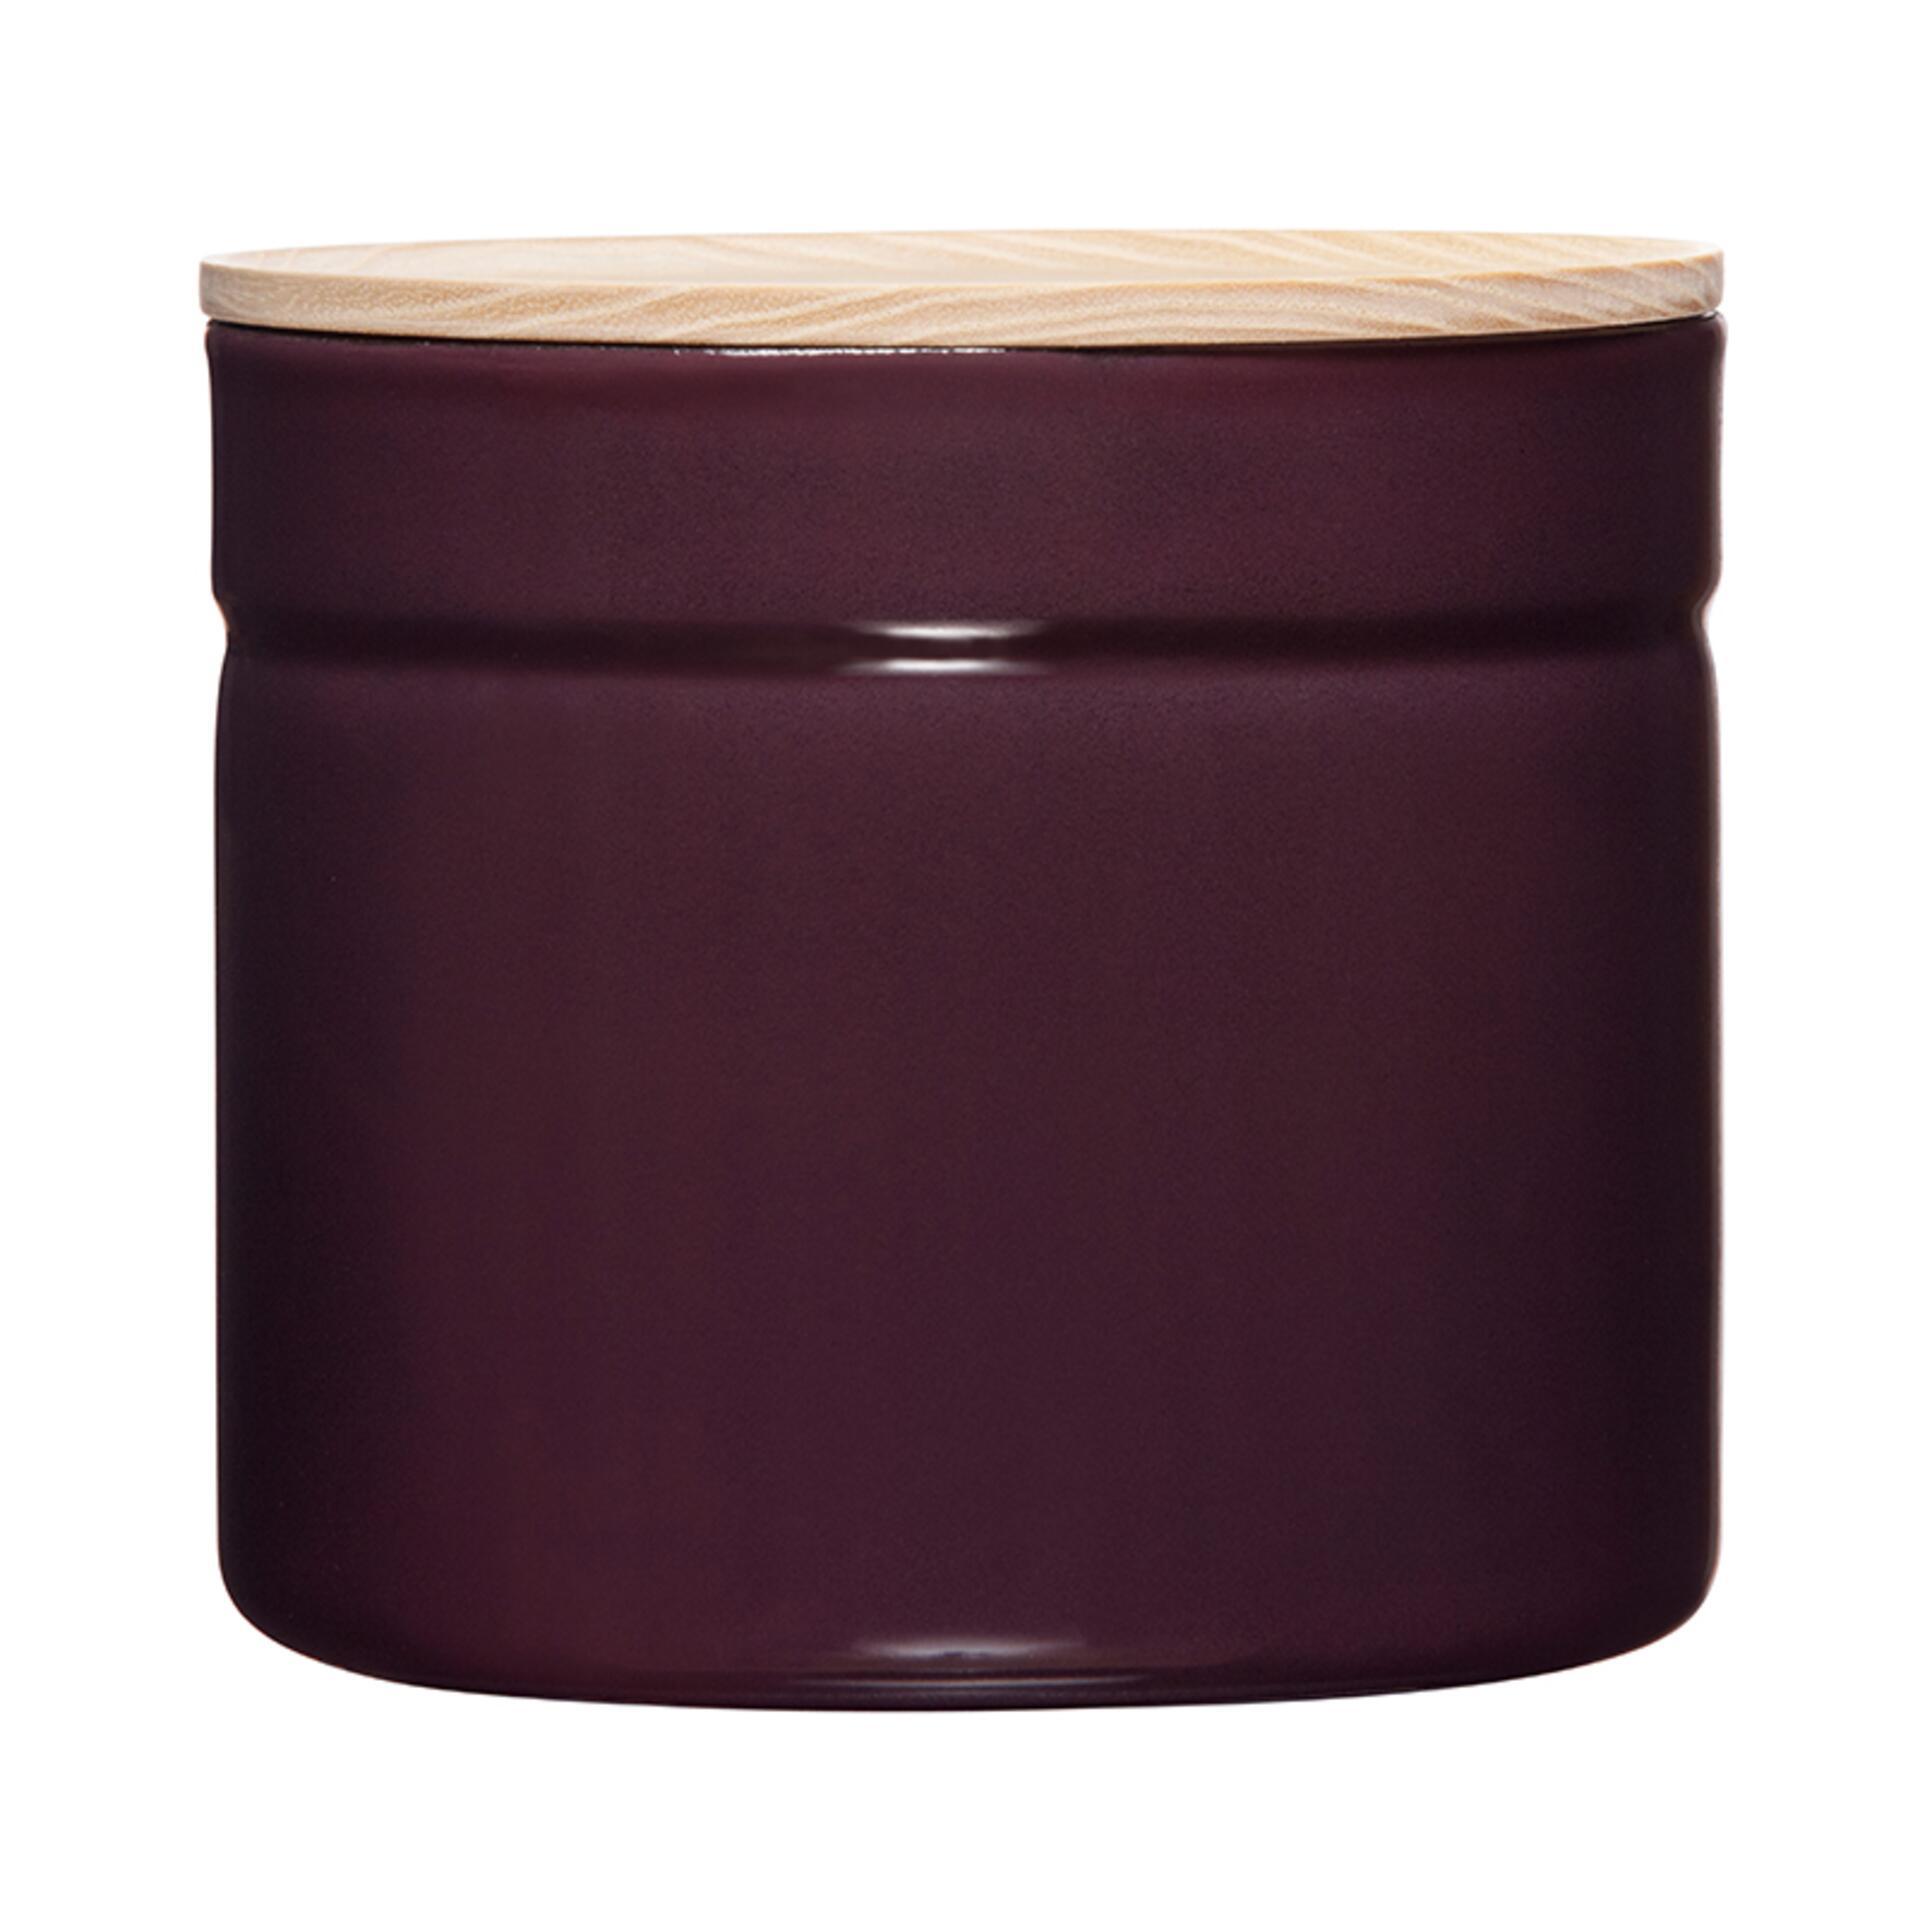 Riess Vorratsdose 1350 ml Lila